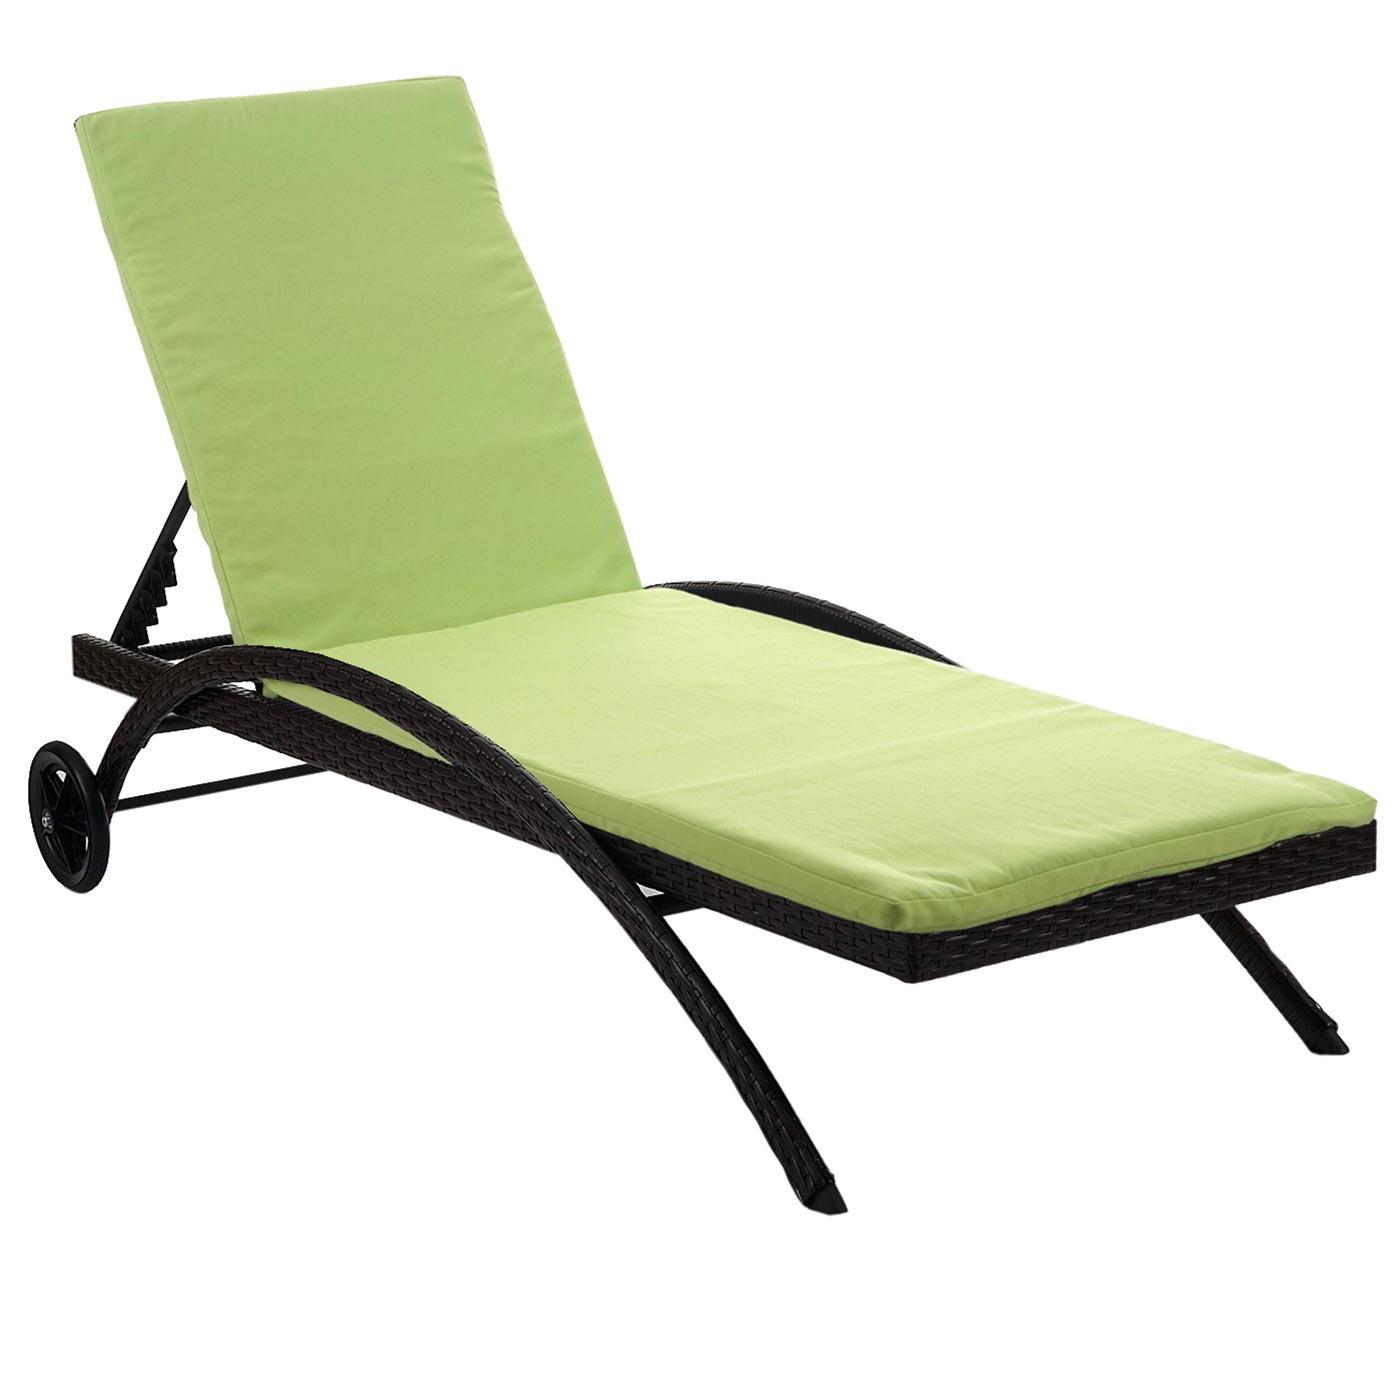 Sonnenliege kastoria relaxliege gartenliege poly rattan for Chaise longue relax jardin